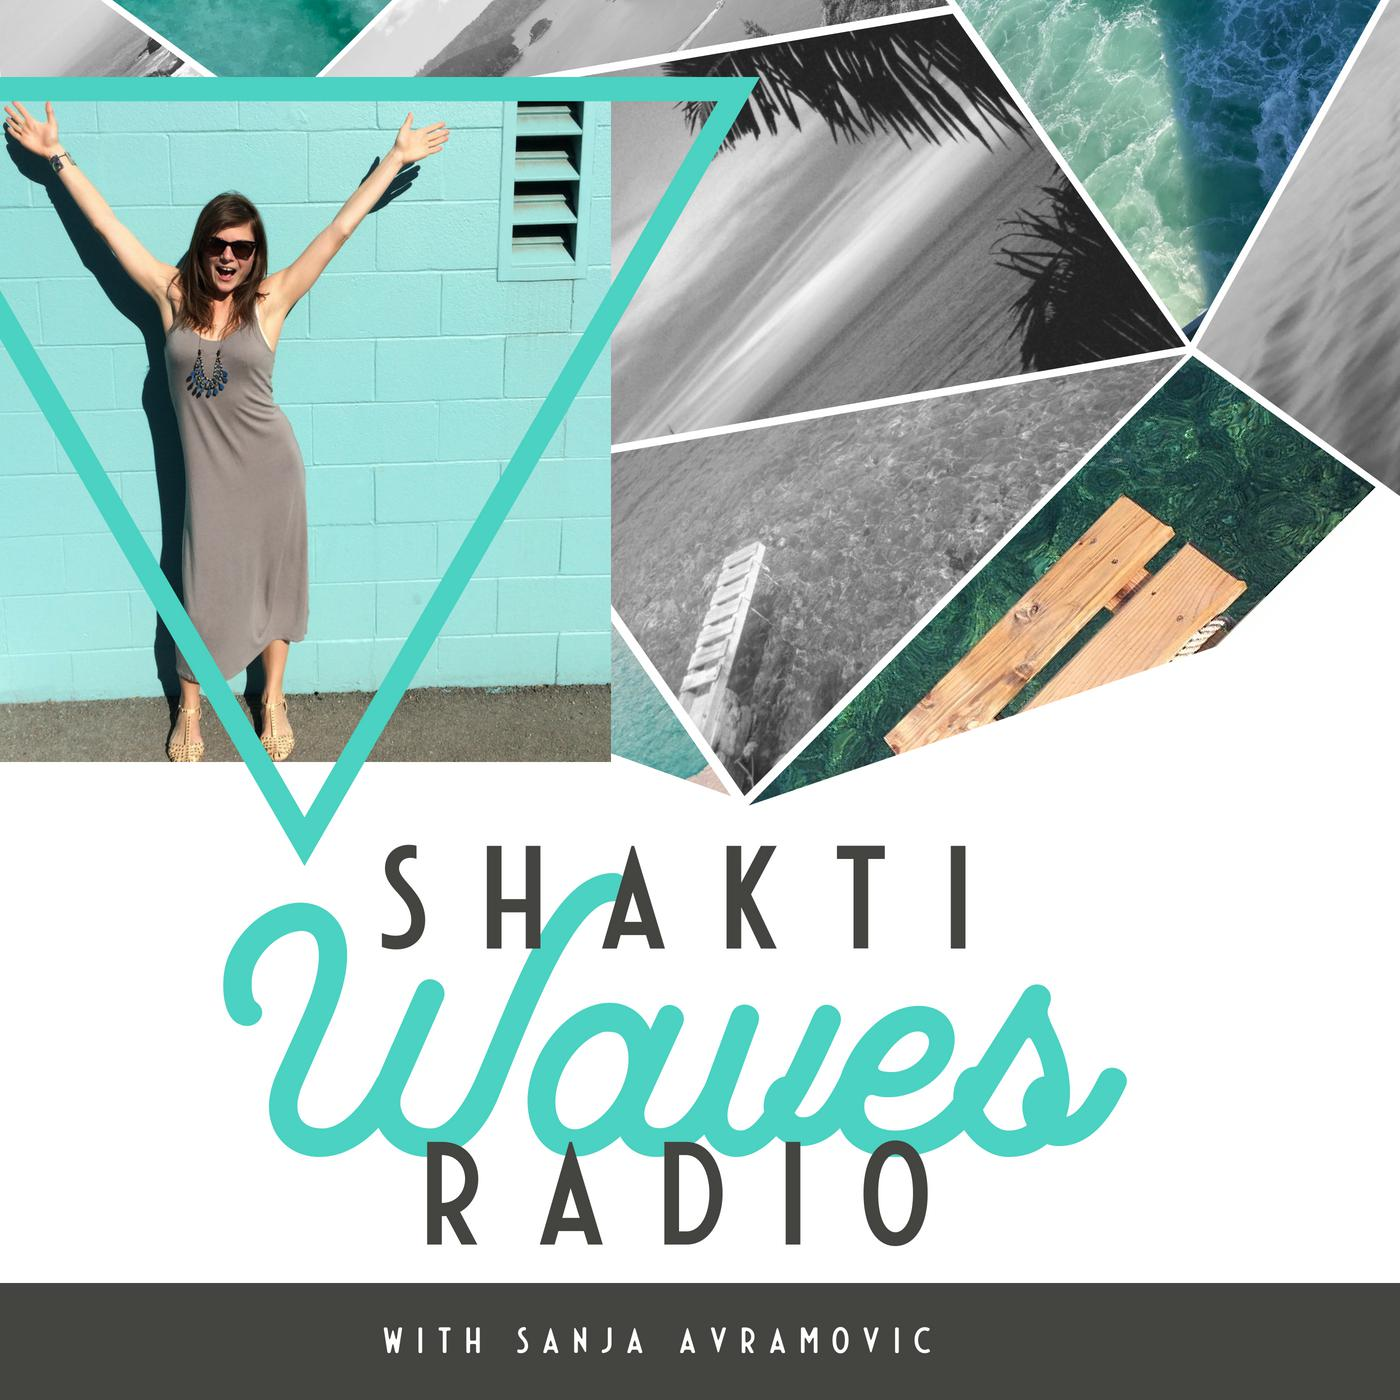 Shakti Waves Radio (podcast) - Sanja Avramovic   Listen Notes